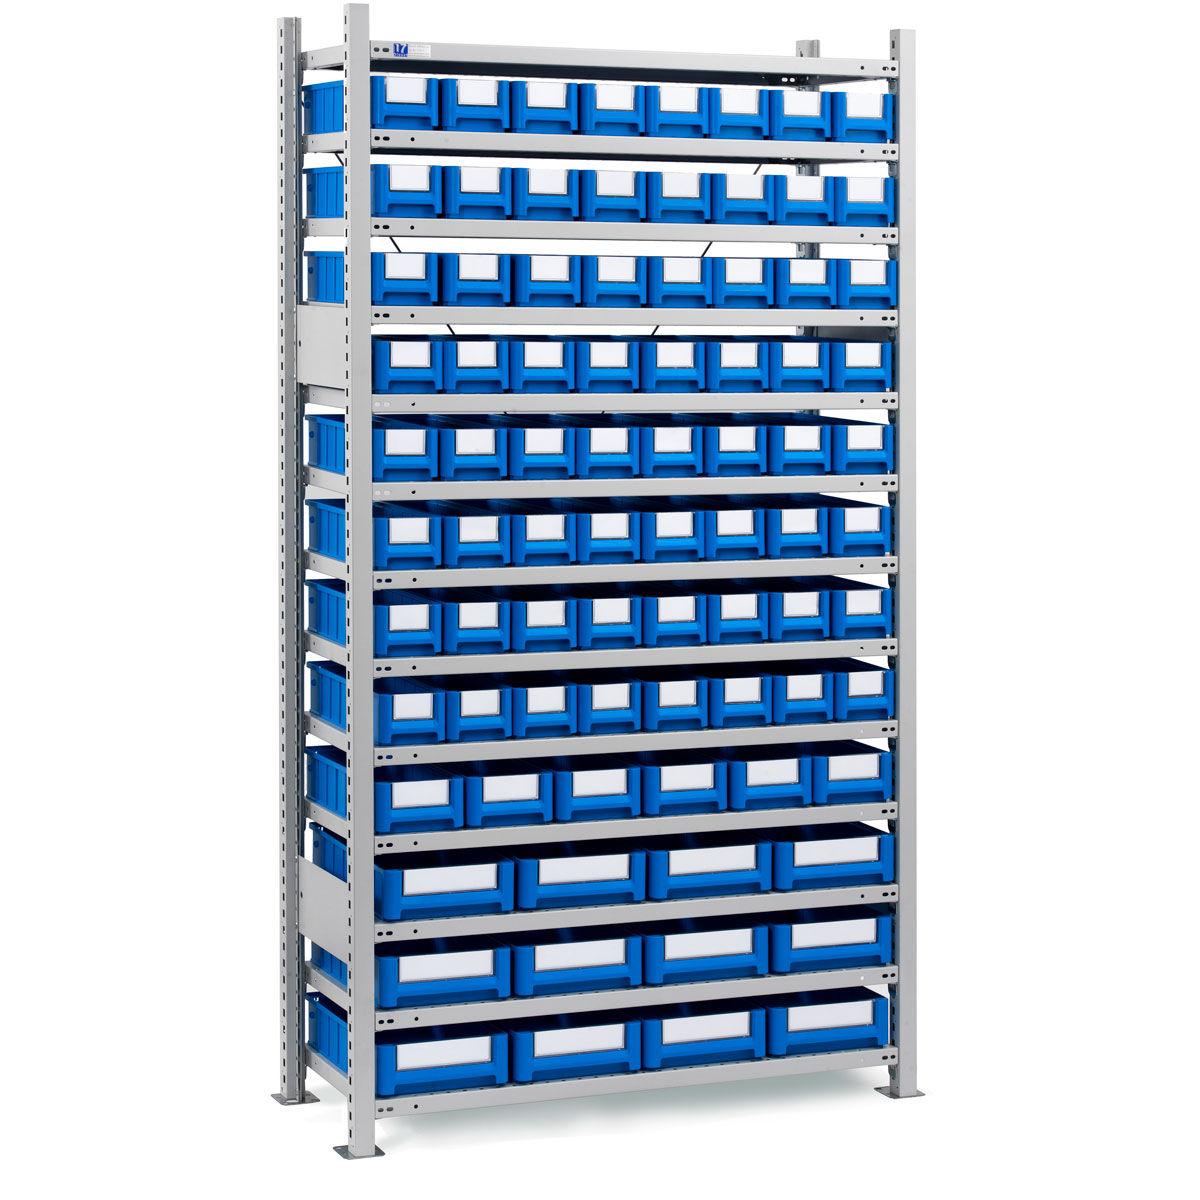 Estanter as con cajas de pl stico - Cajas para estanterias ...